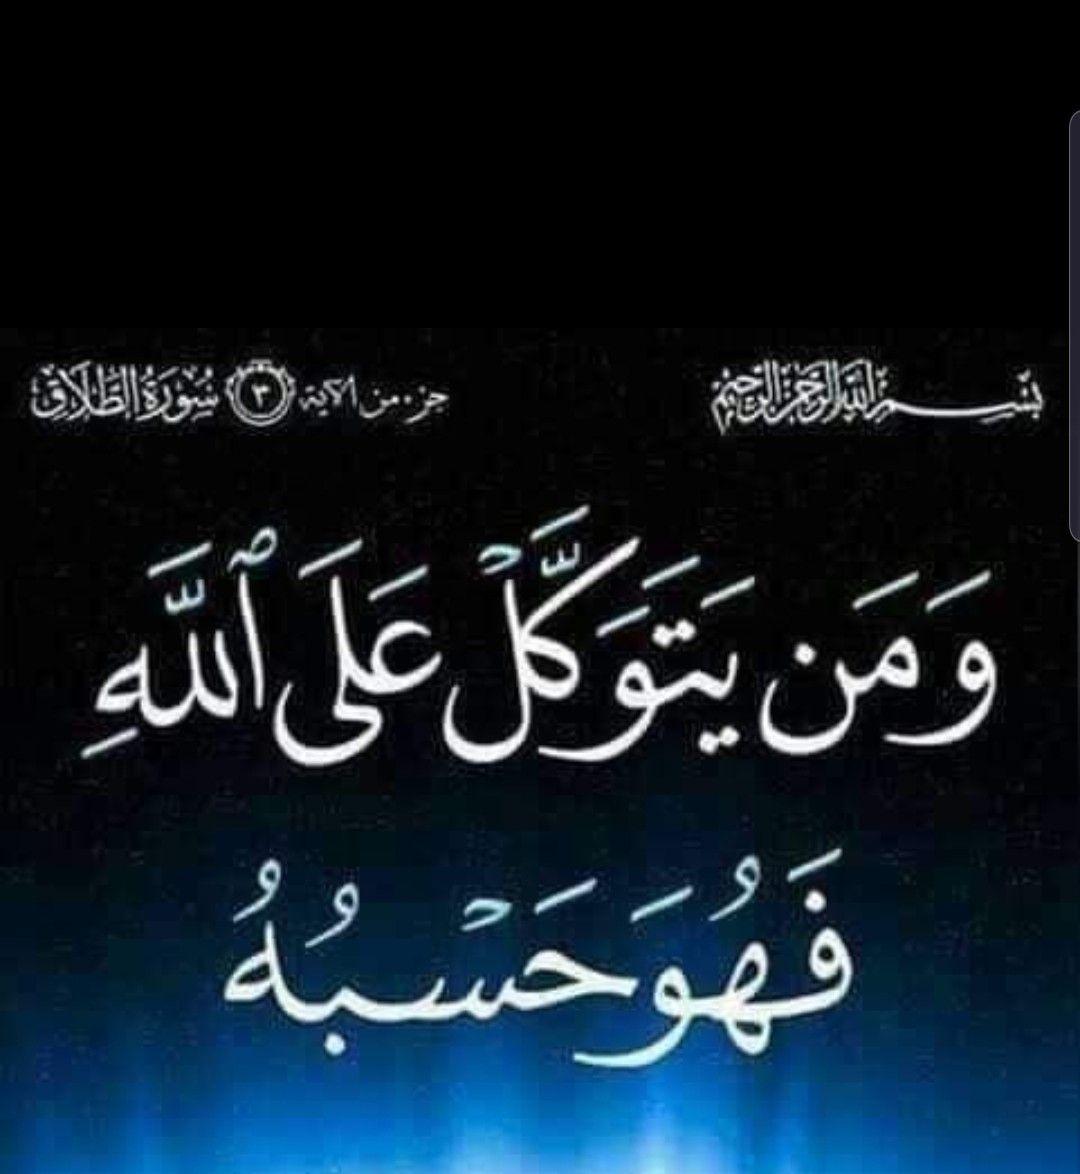 Pin By The Noble Quran On I Love Allah Quran Islam The Prophet Miracles Hadith Heaven Prophets Faith Prayer Dua حكم وعبر احاديث الله اسلام قرآن دعاء Duaa Islam Islam Quran